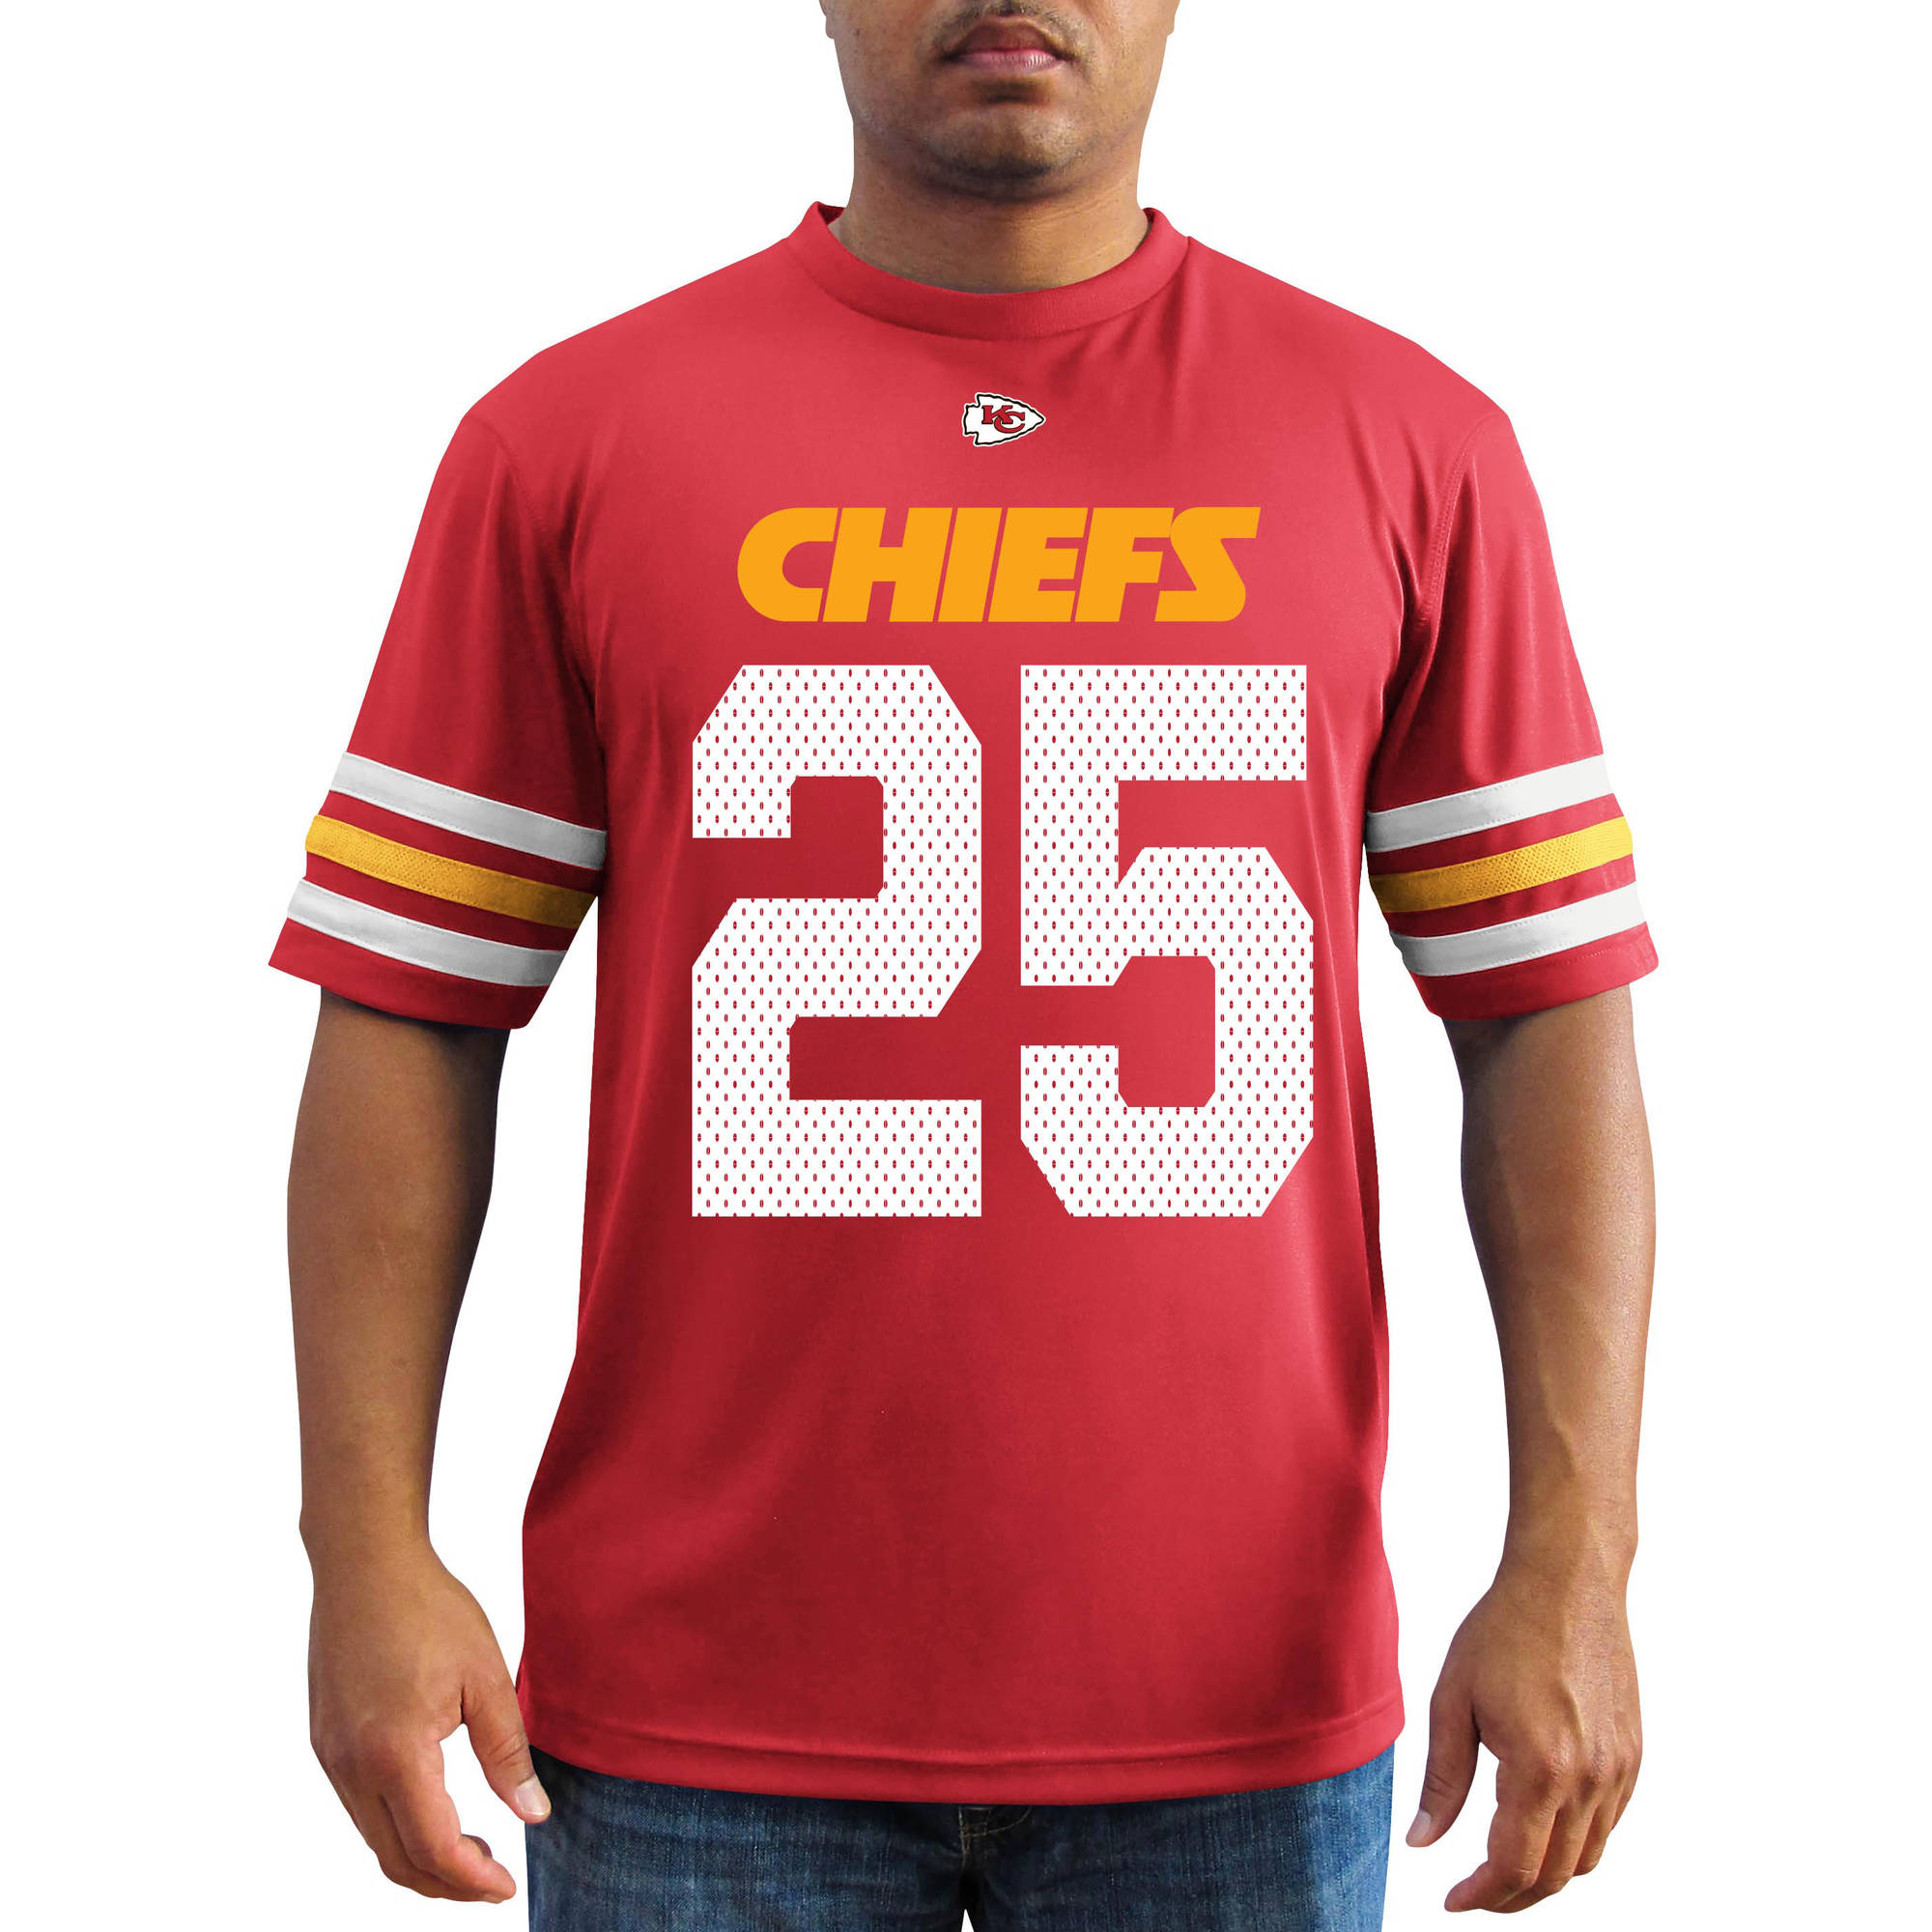 NFL Men's Kansas City Chiefs Charles Jersey